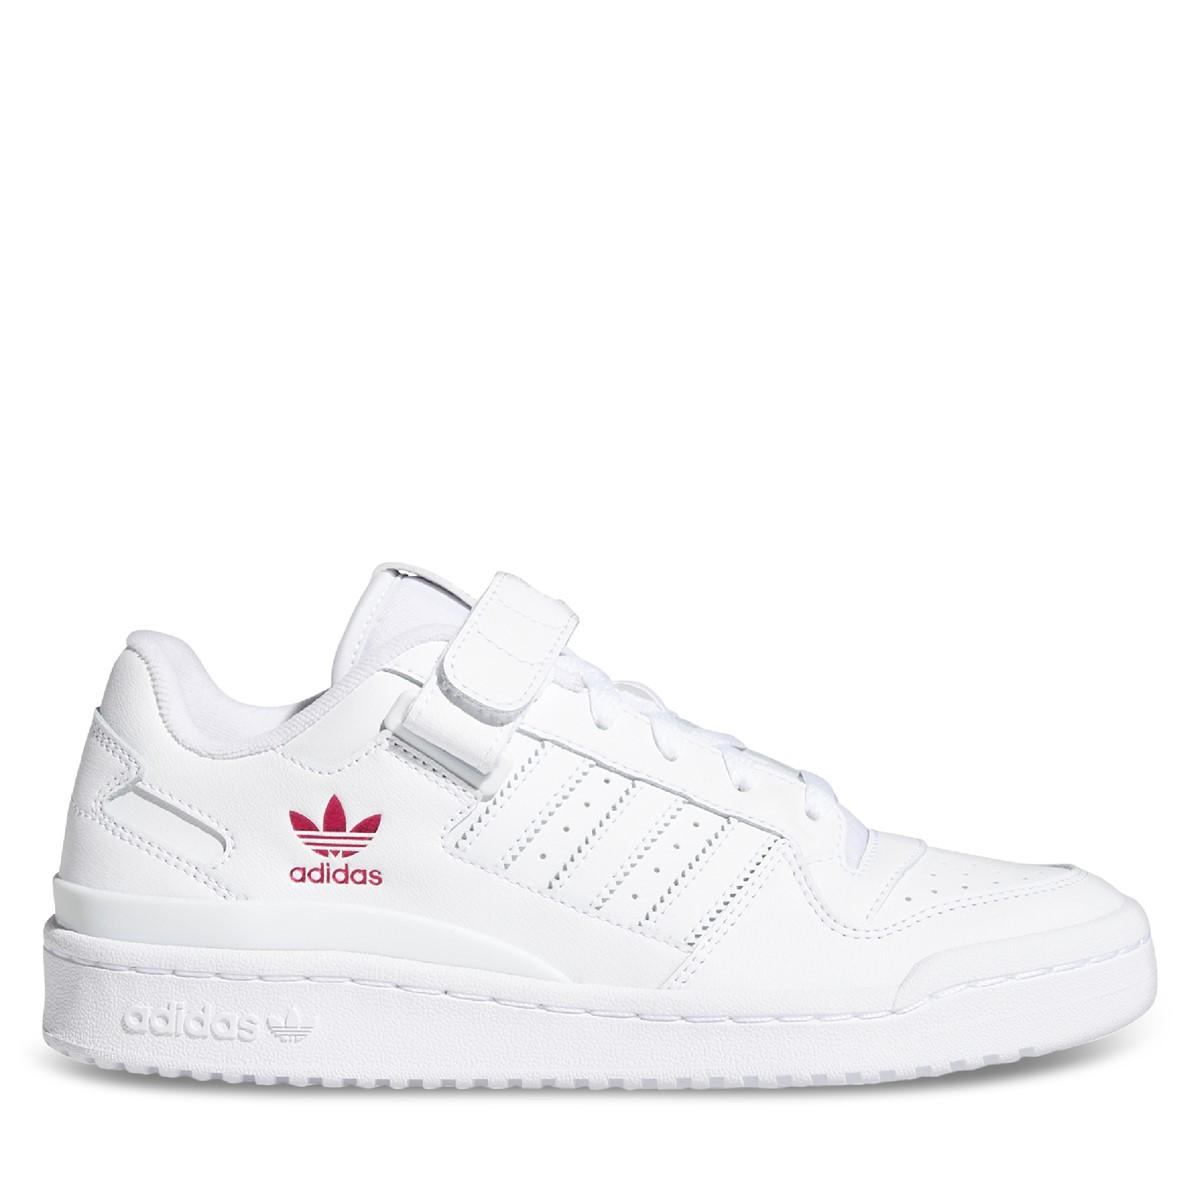 Women's Low Forum Sneakers in White/Pink